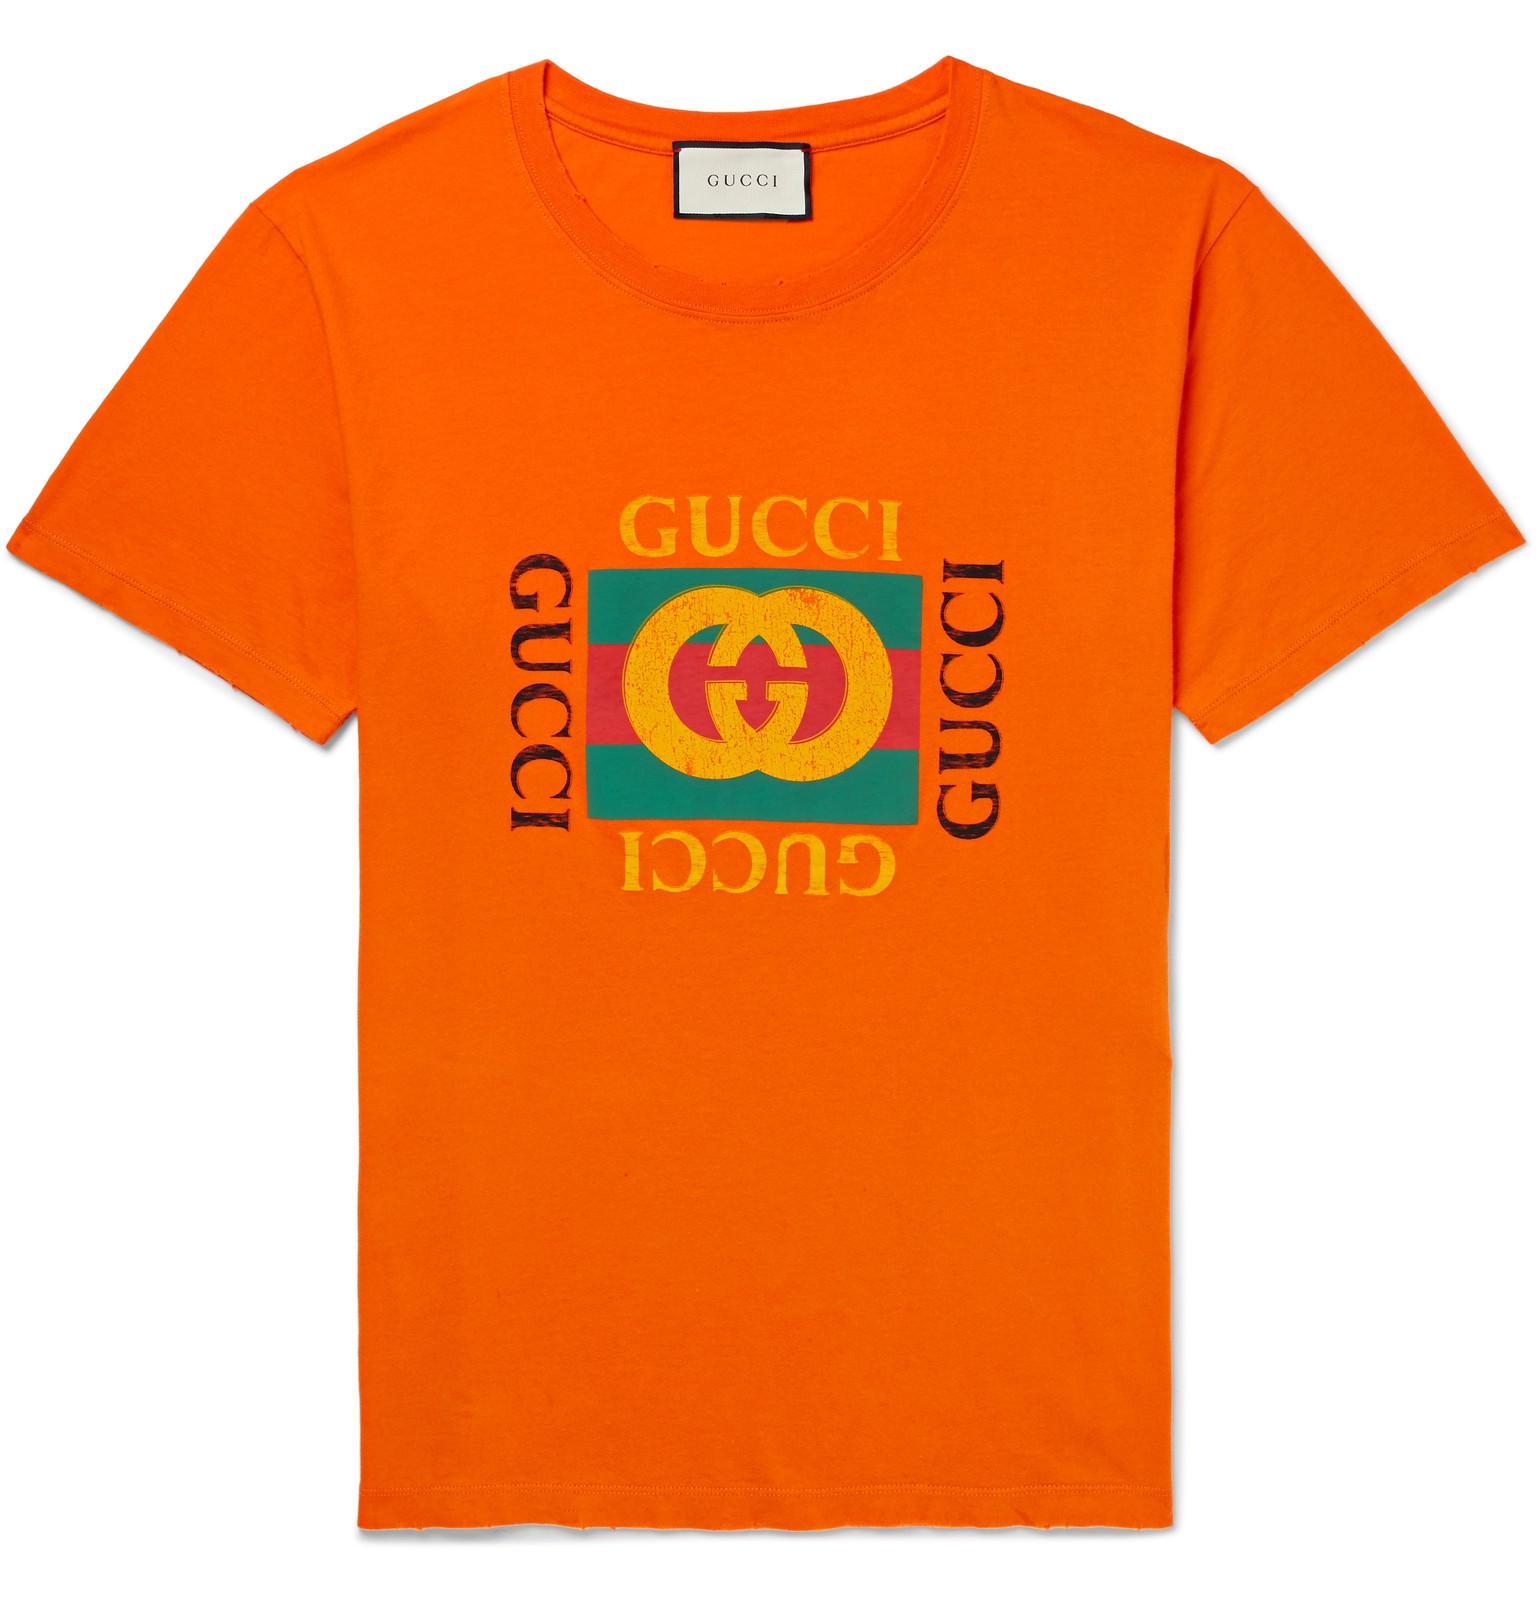 c29c0f7ffce Gucci Distressed Printed Cotton-jersey T-shirt in Orange for Men ...